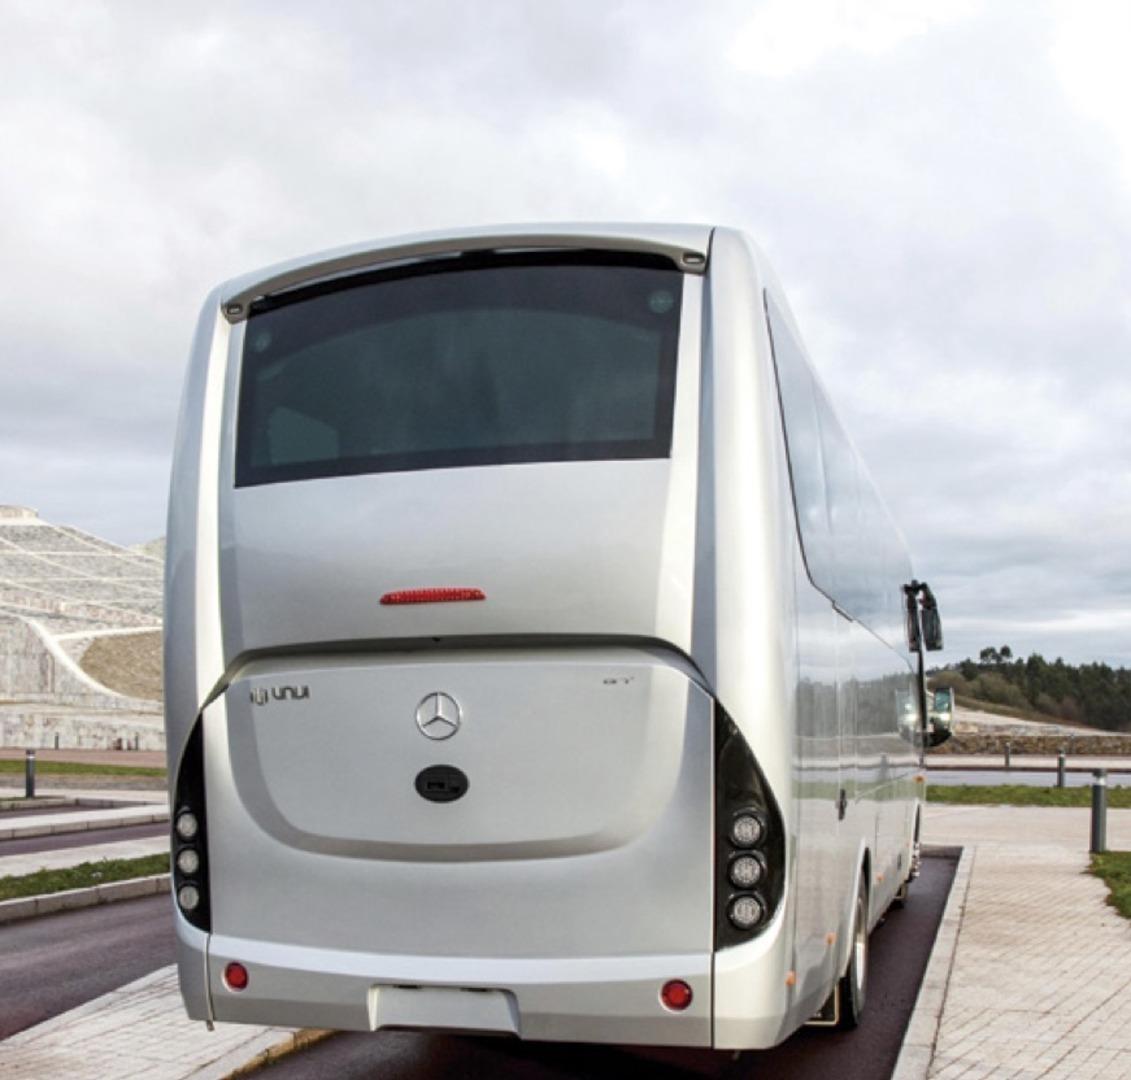 MERCEDES-BENZ UNVI Touring GT, Touring GT